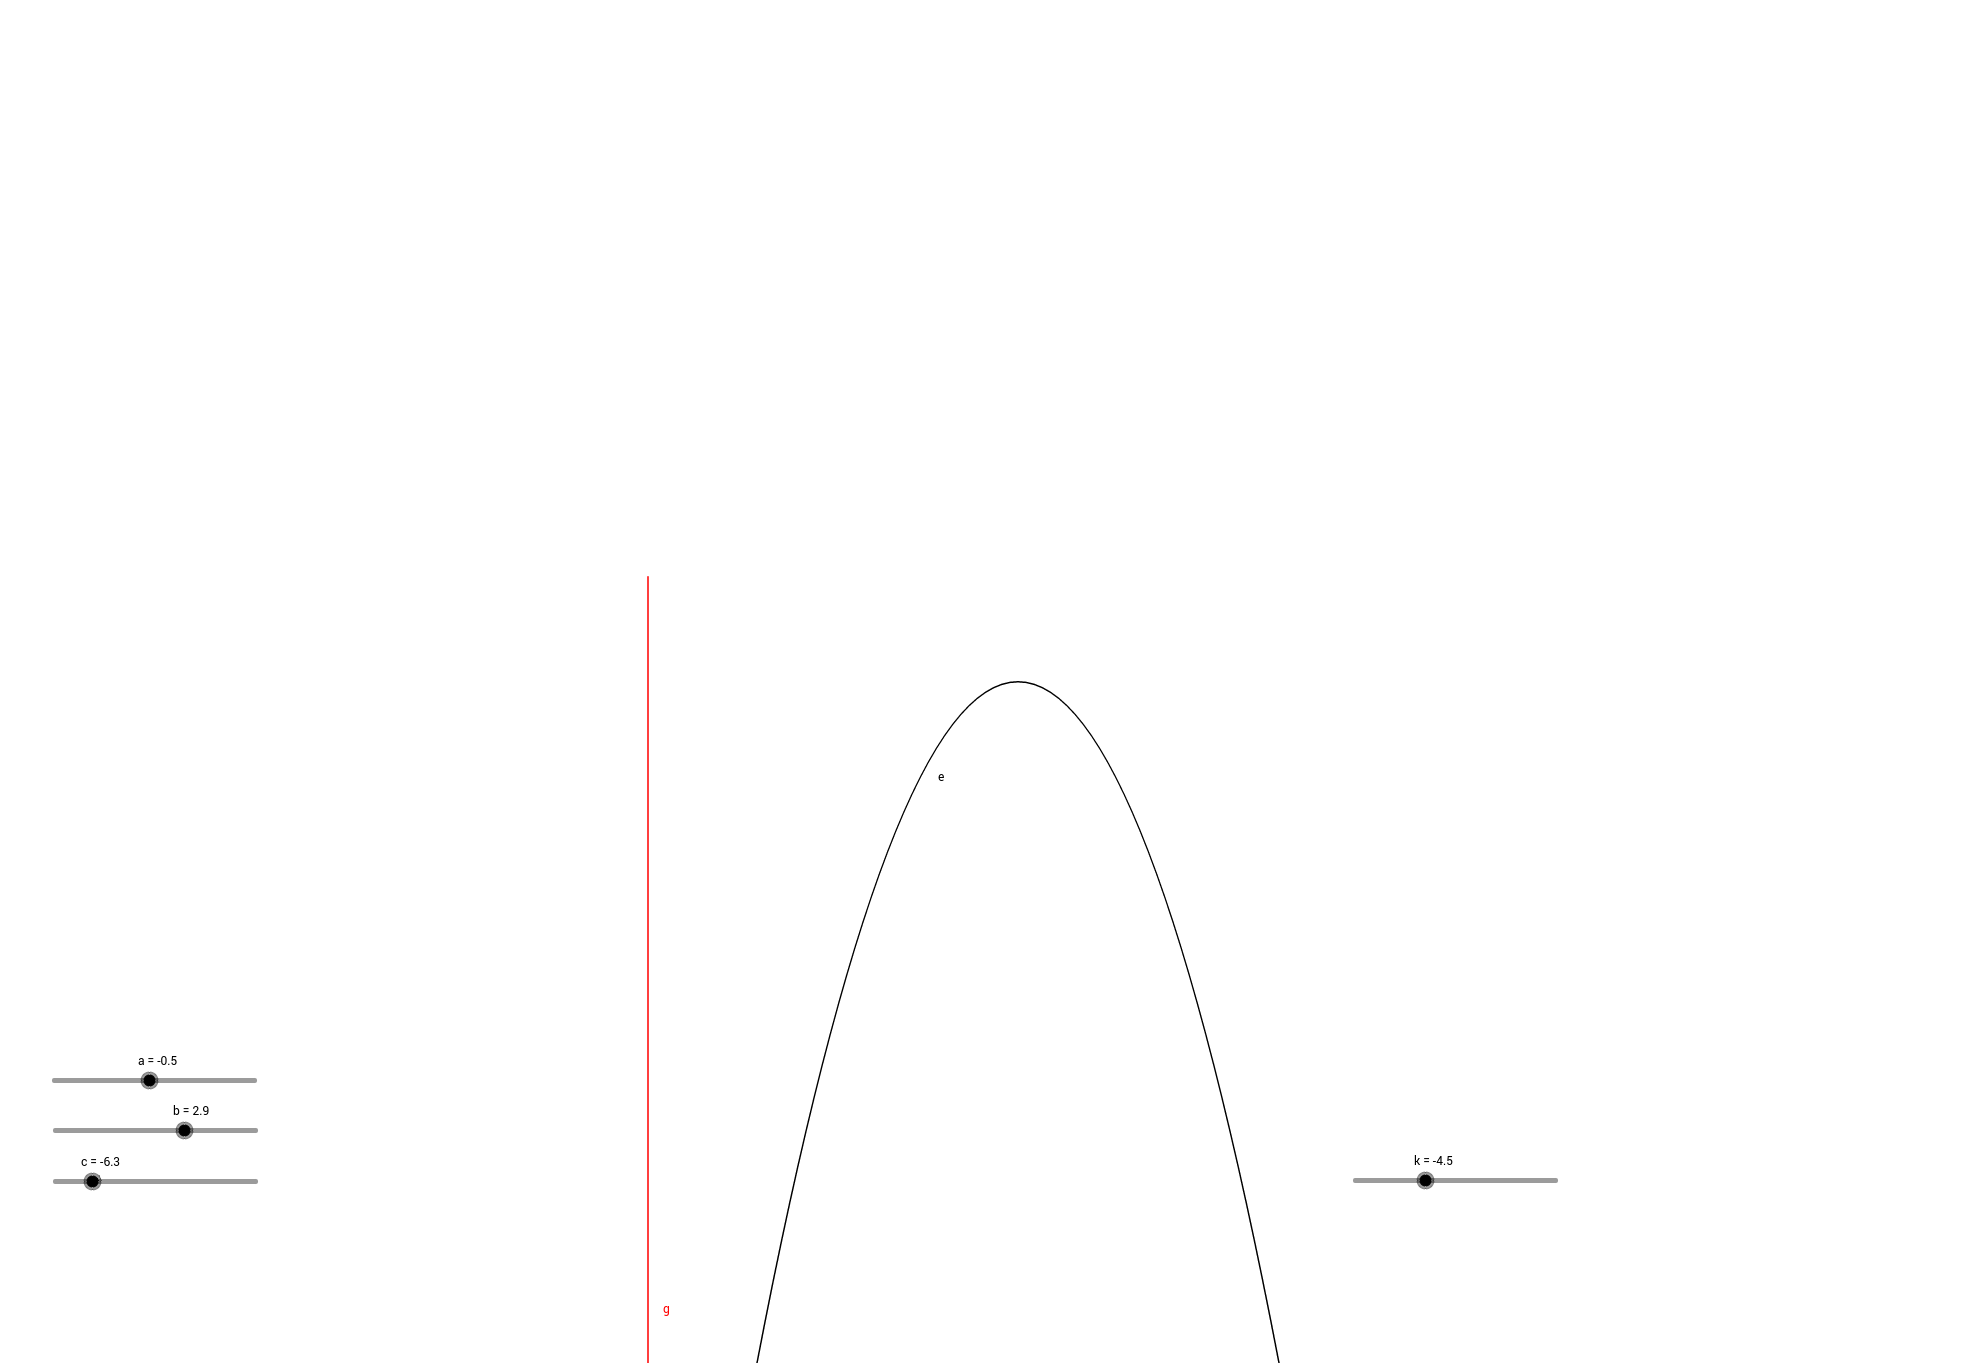 Learning Object Parabola